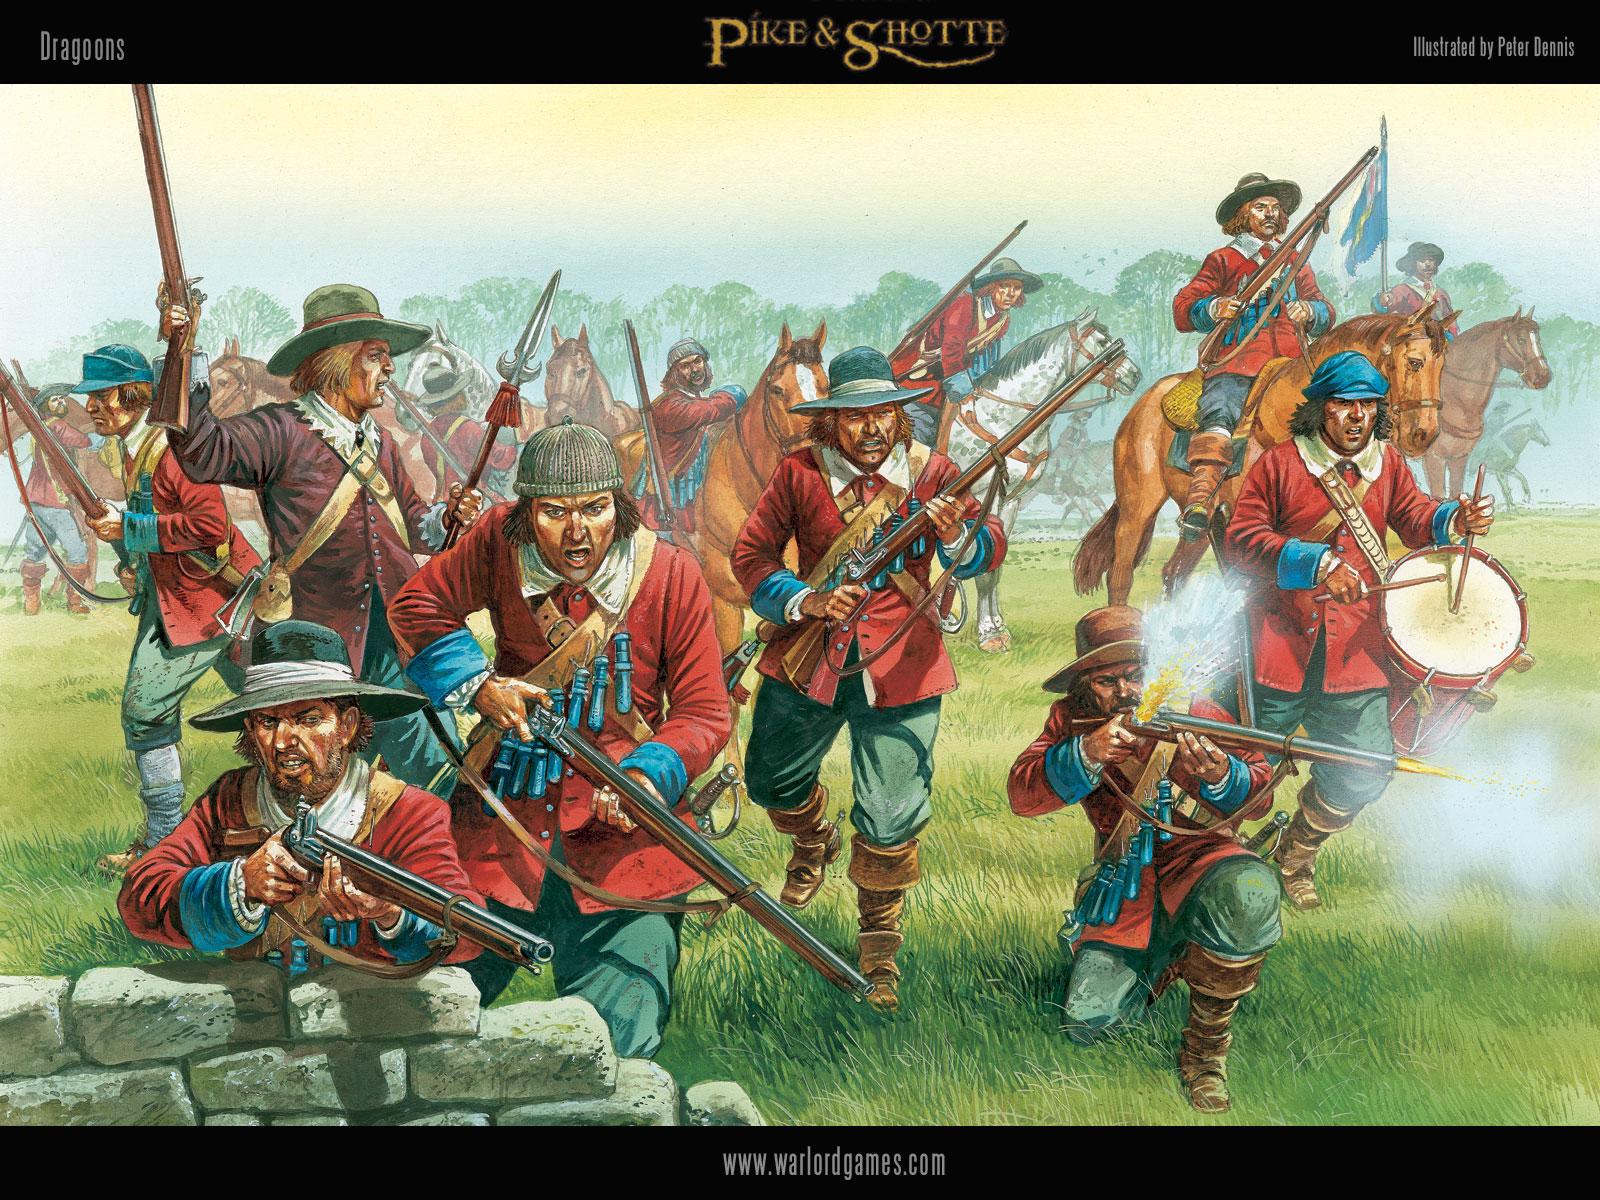 Illustrations P&S Dragoons-wallpaper